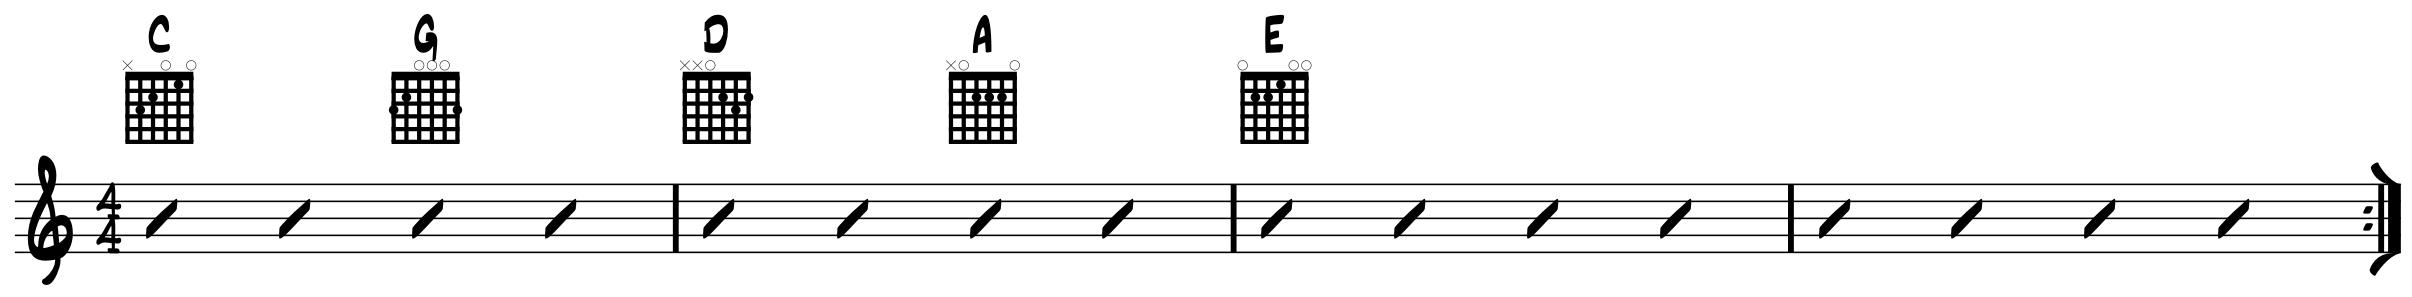 Hey Joe chord chart